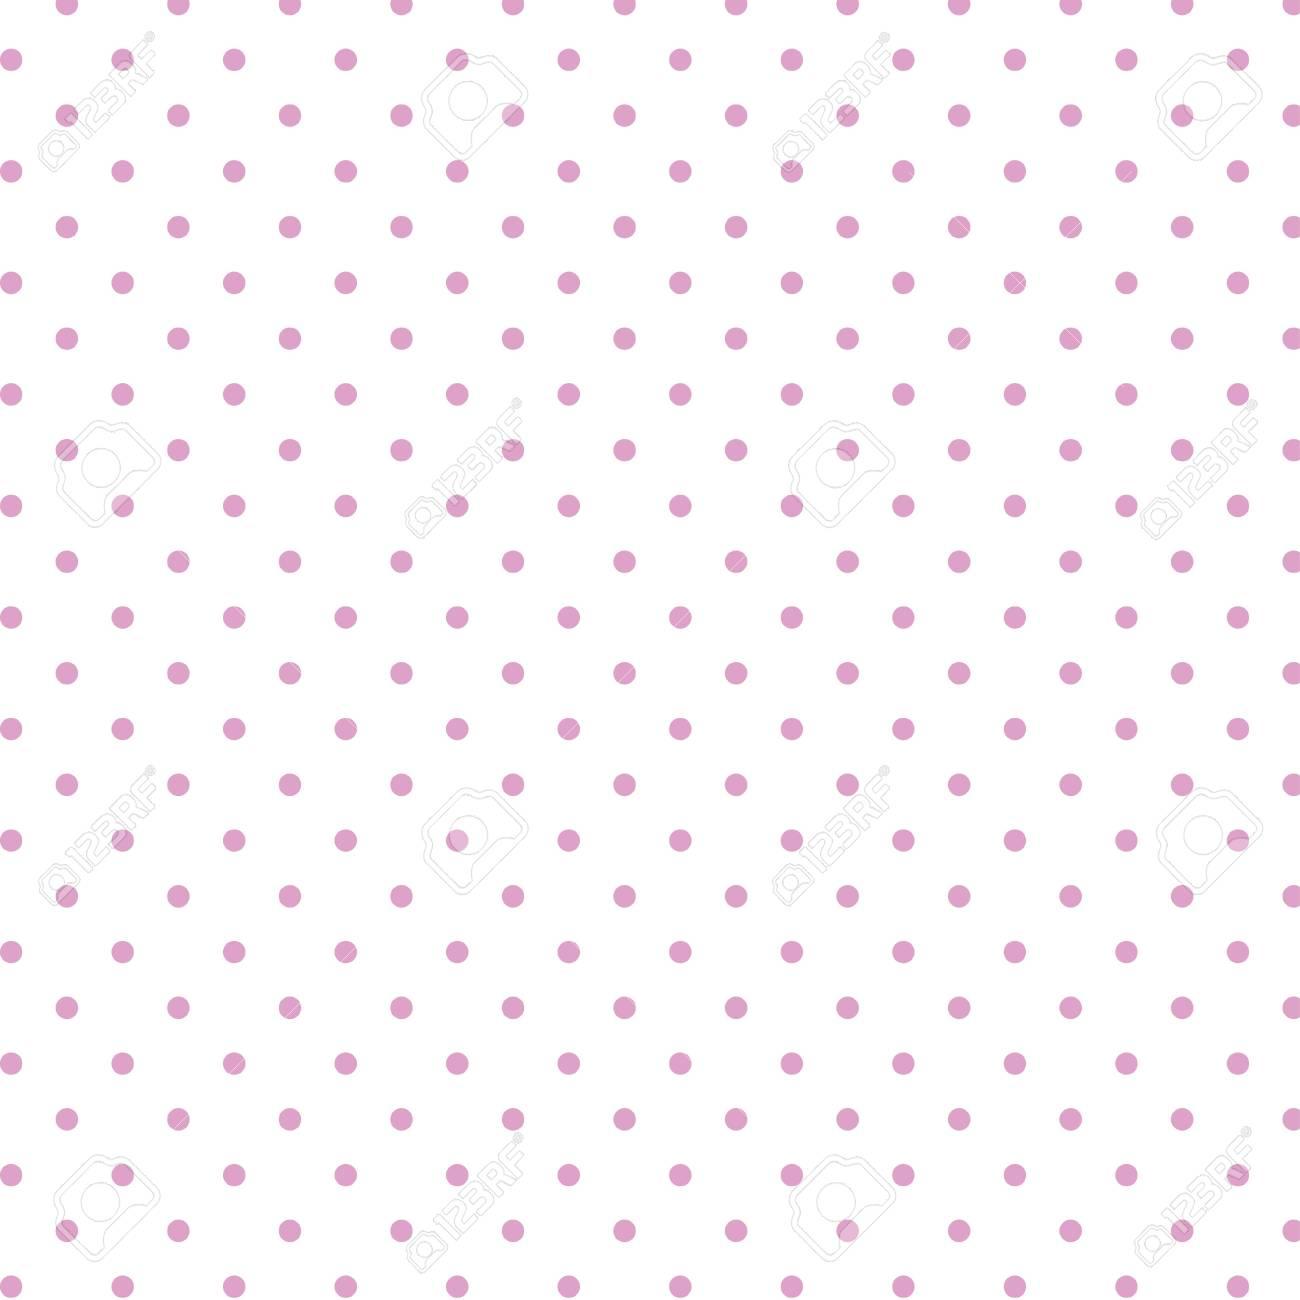 Polka dot background pattern - 114708569